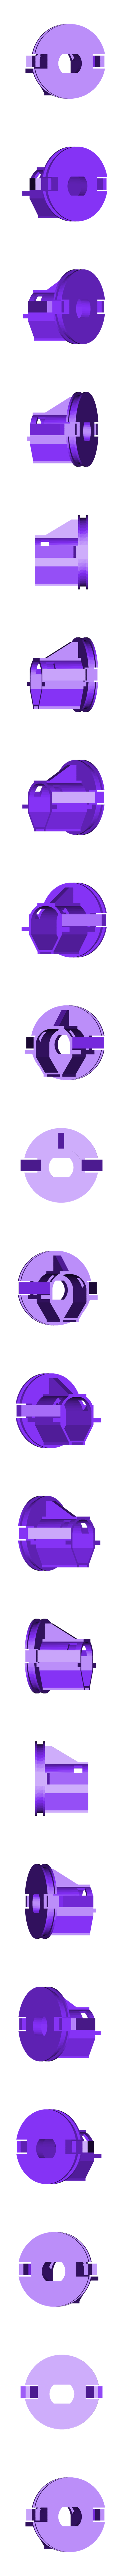 capteur dacia.STL Download free STL file door contactor dacia renault • 3D printer design, Jeantez